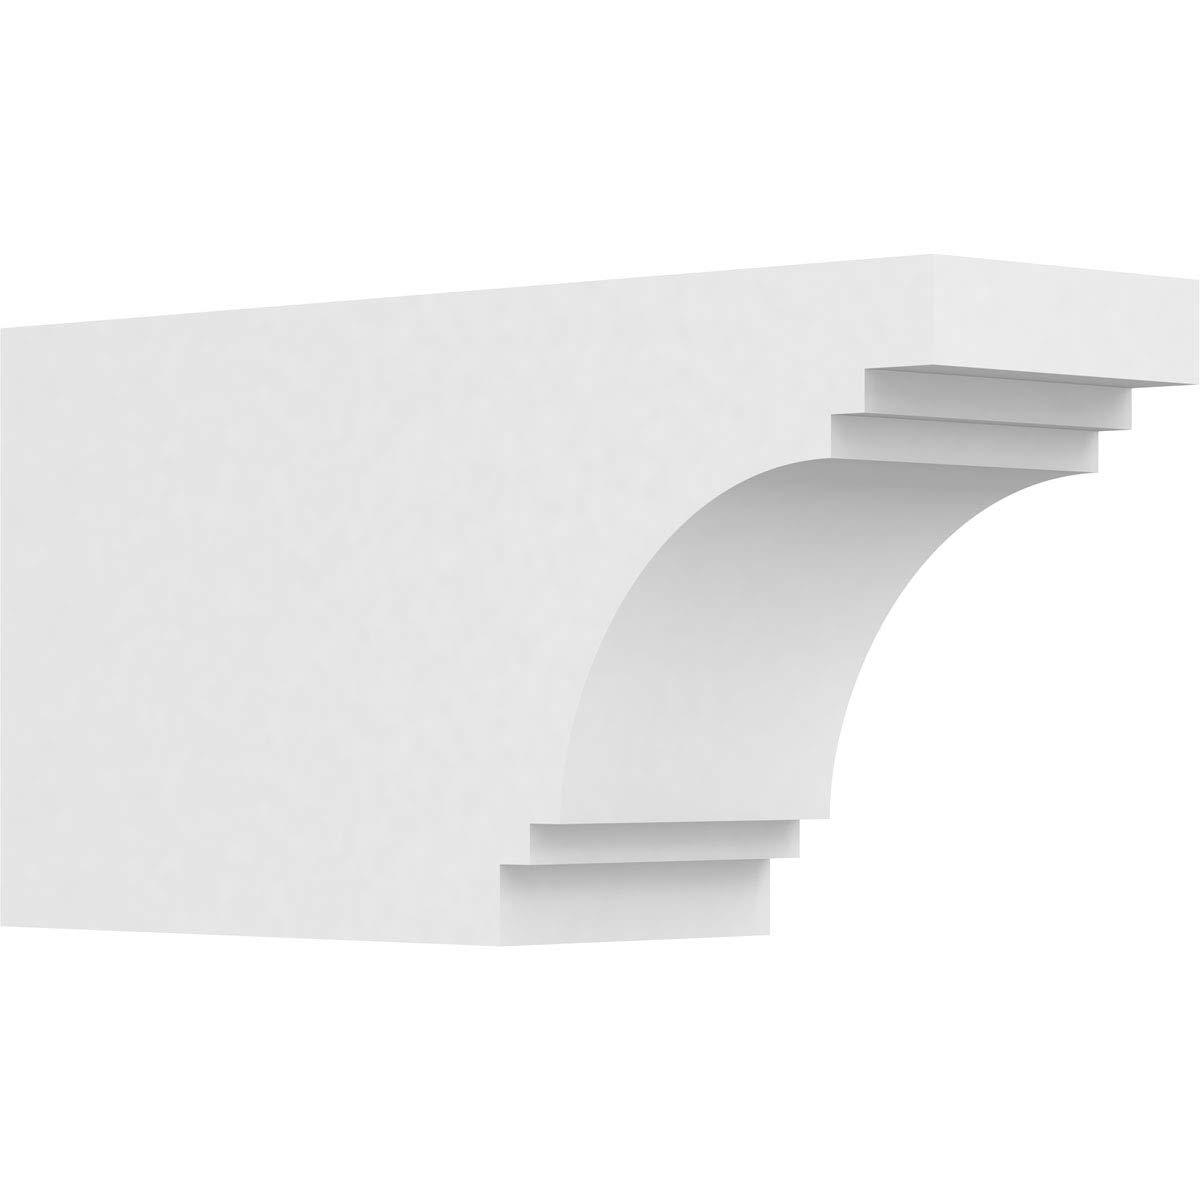 Ekena Millwork RFTP05X08X16PEC Pescadero Architectural Grade PVC Rafter Tail, 5''W X 8''H X 16''L, Unfinished by Ekena Millwork